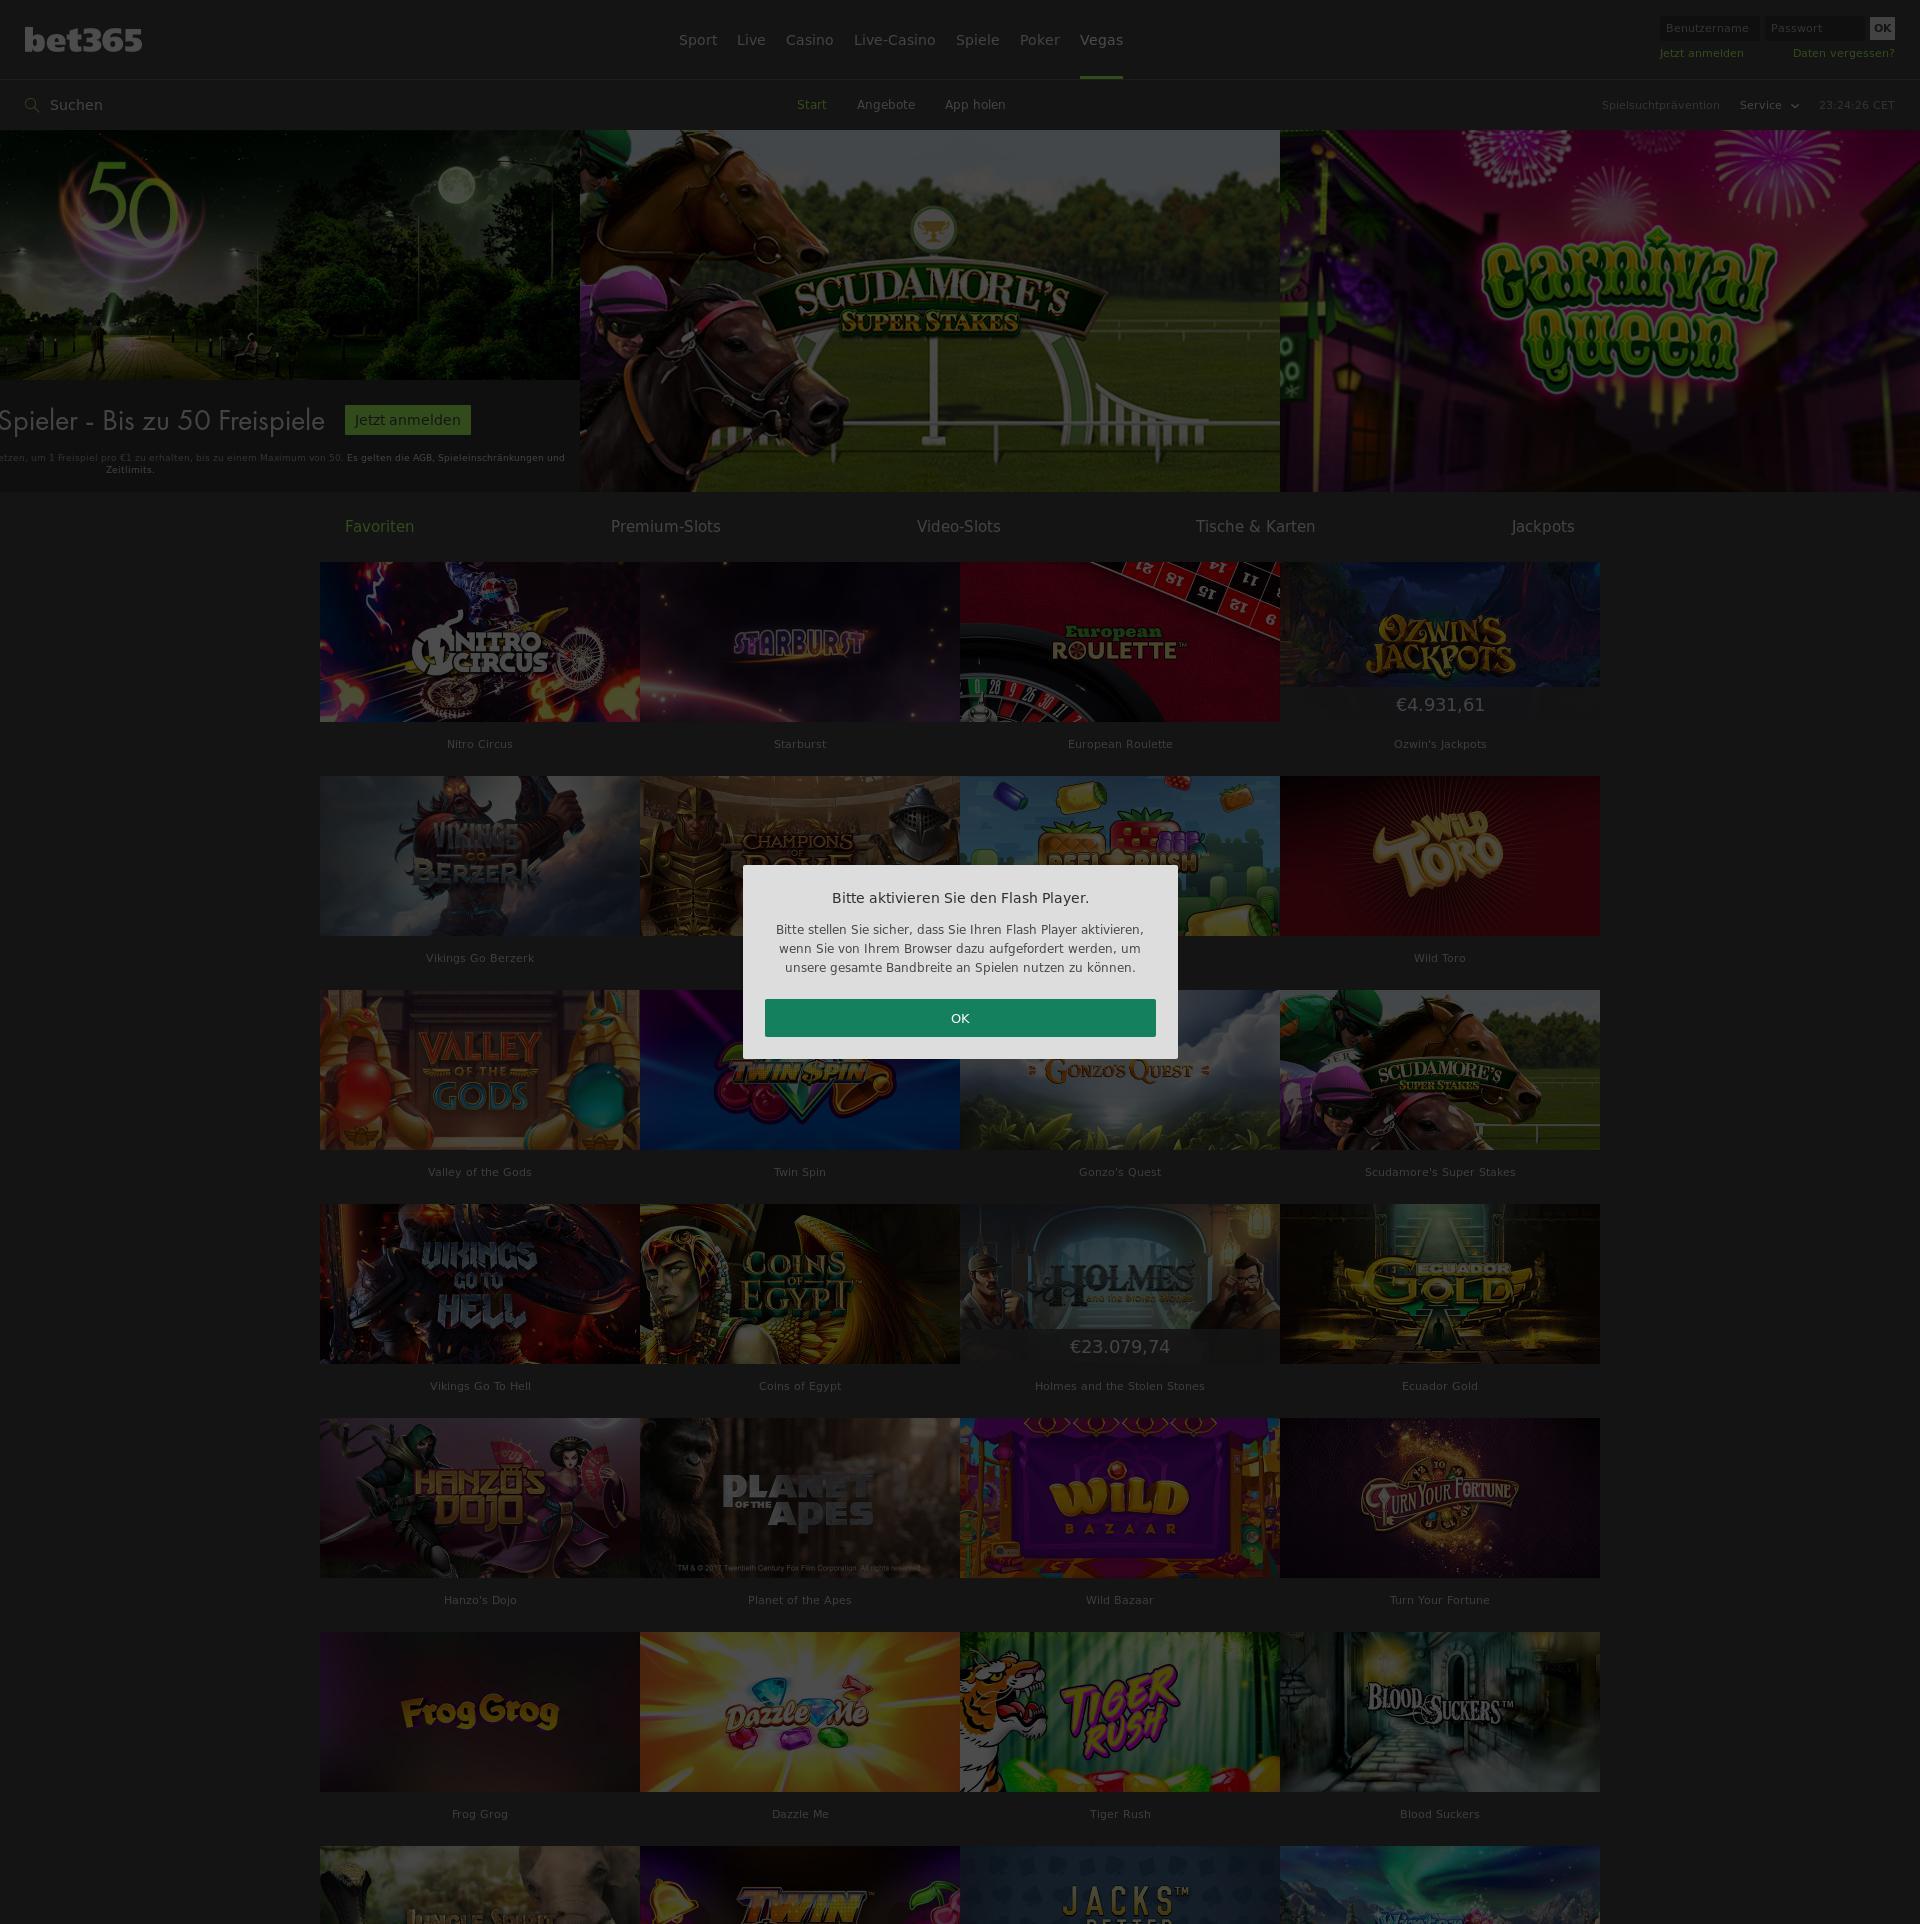 hight resolution of casino screen lobby 2019 04 03 for united kingdom